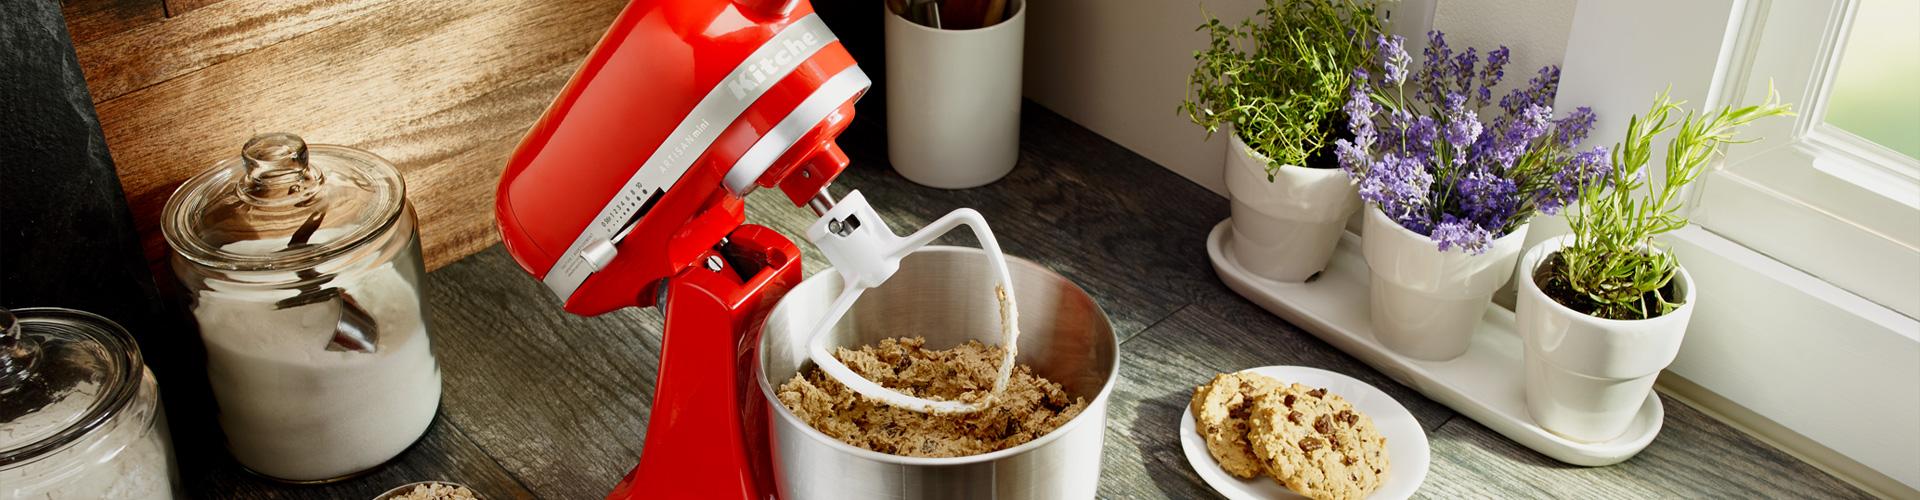 Keukengadgets als blikvanger #keuken #keukeninspiratie